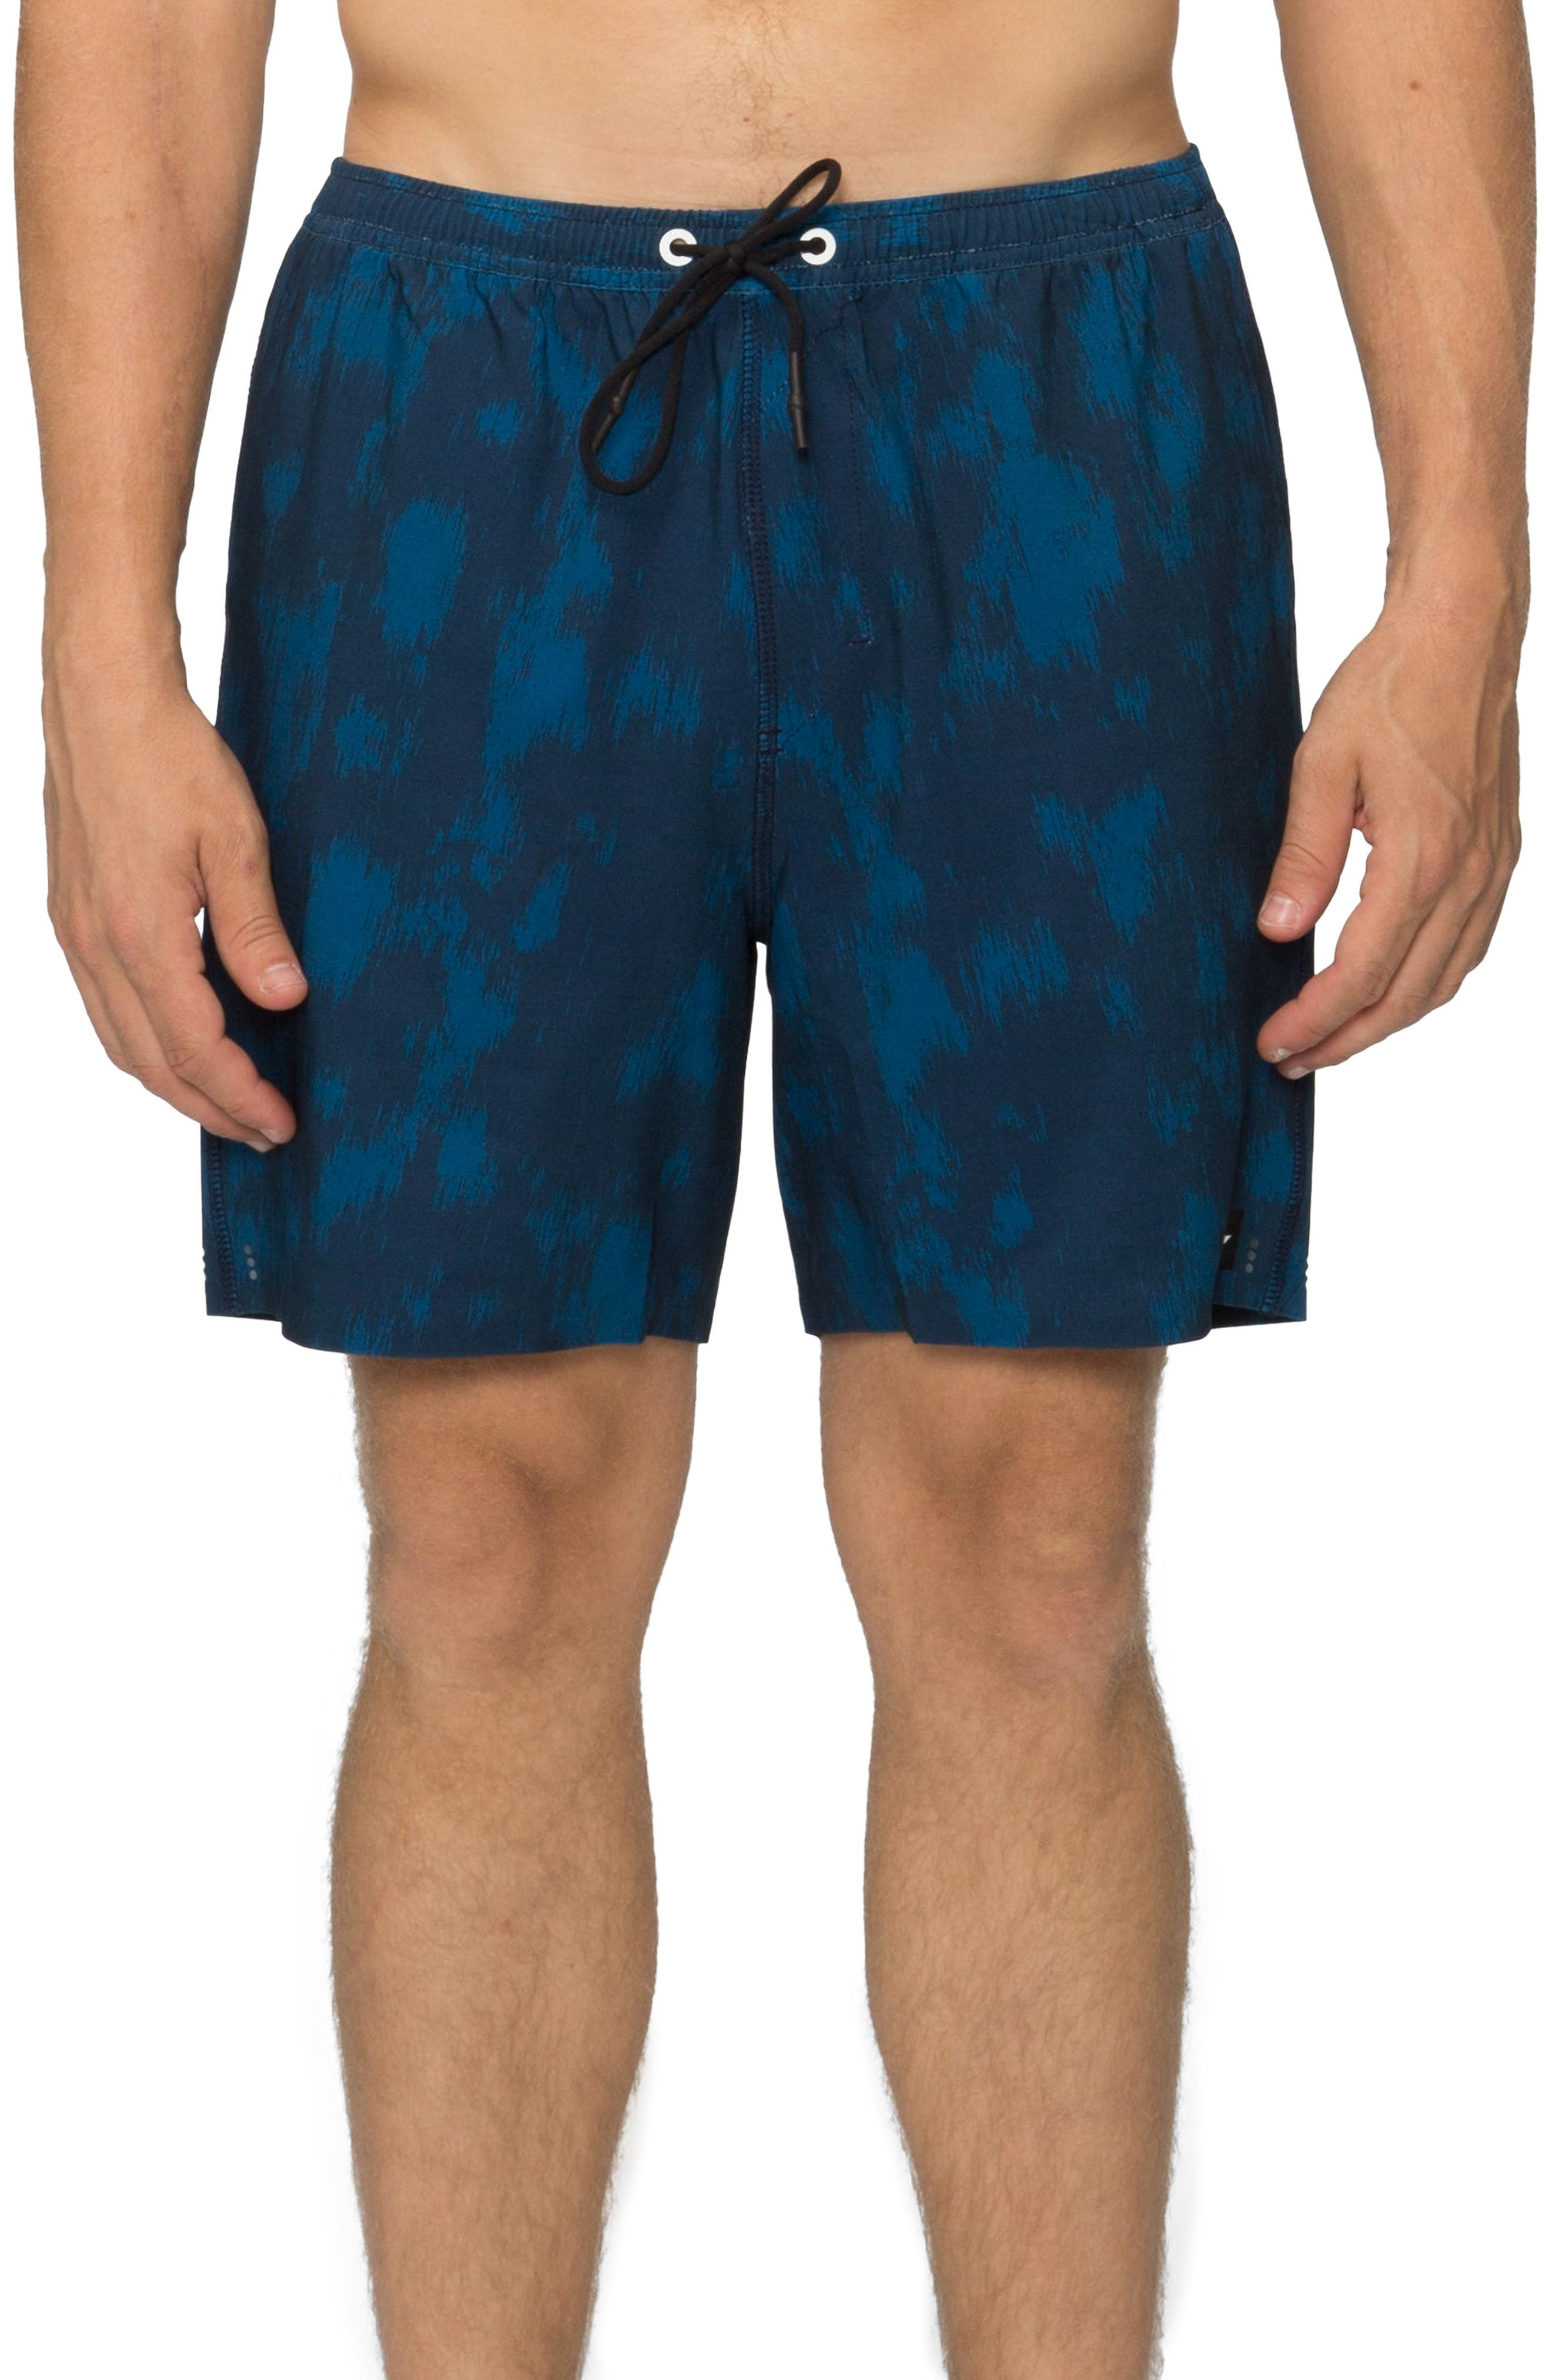 TAVIK Belmont Plus Board Shorts